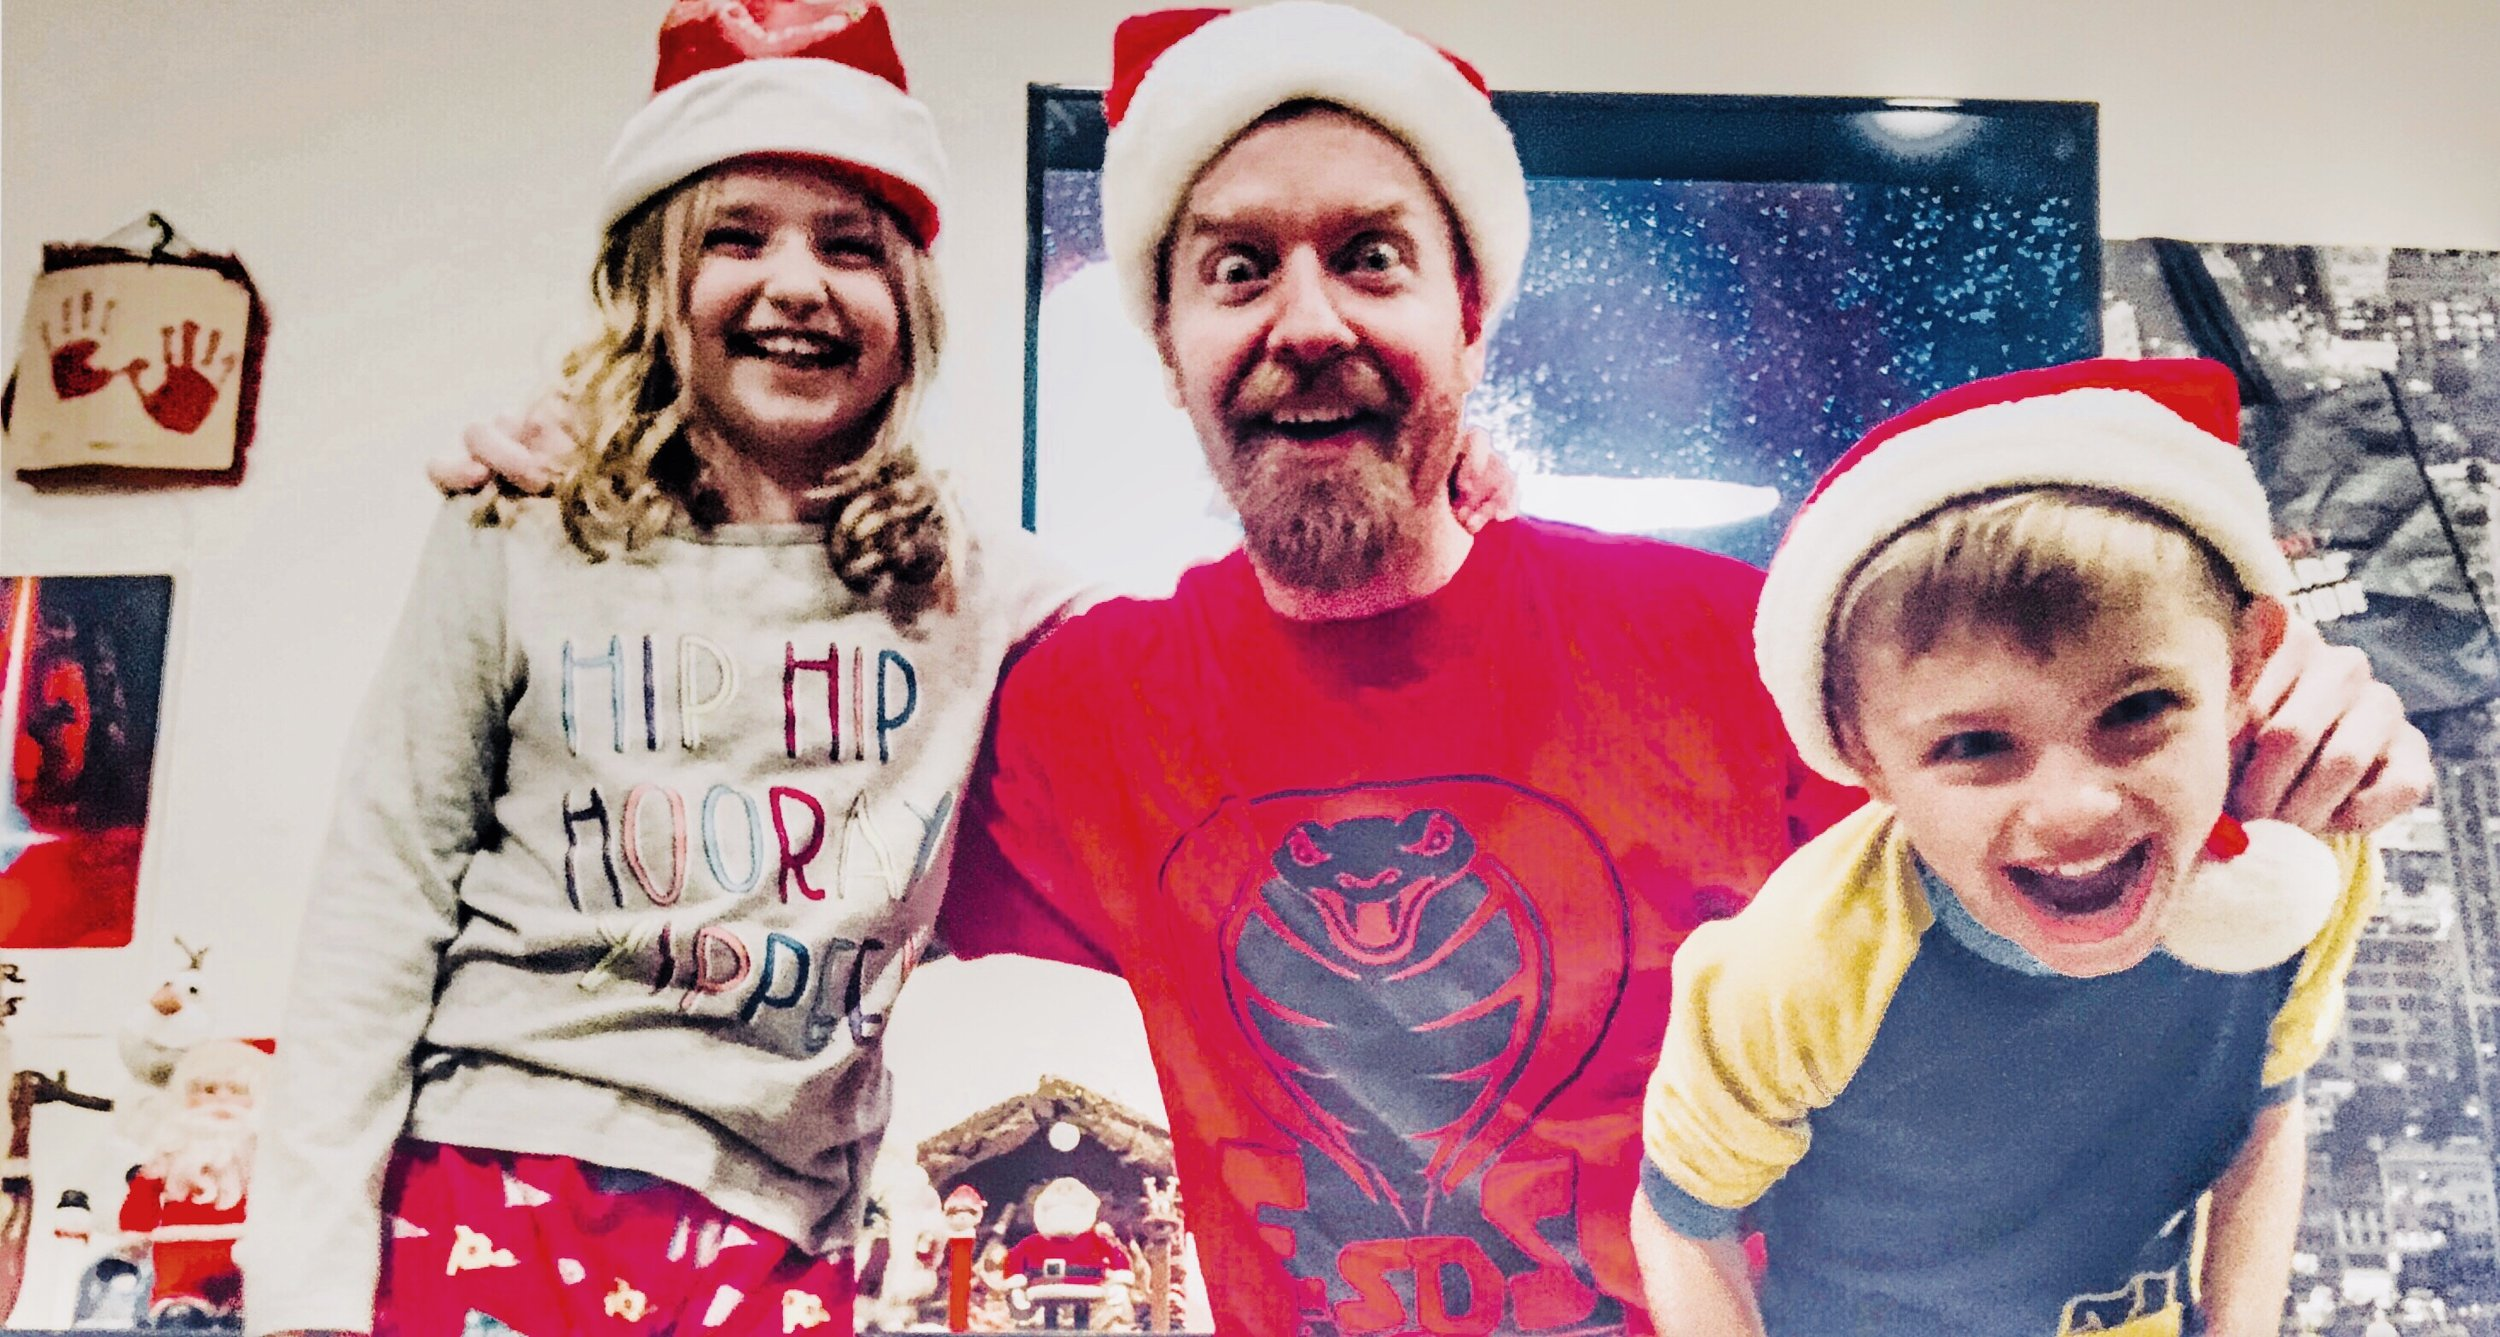 Christmas Kids With Hats 1.jpg